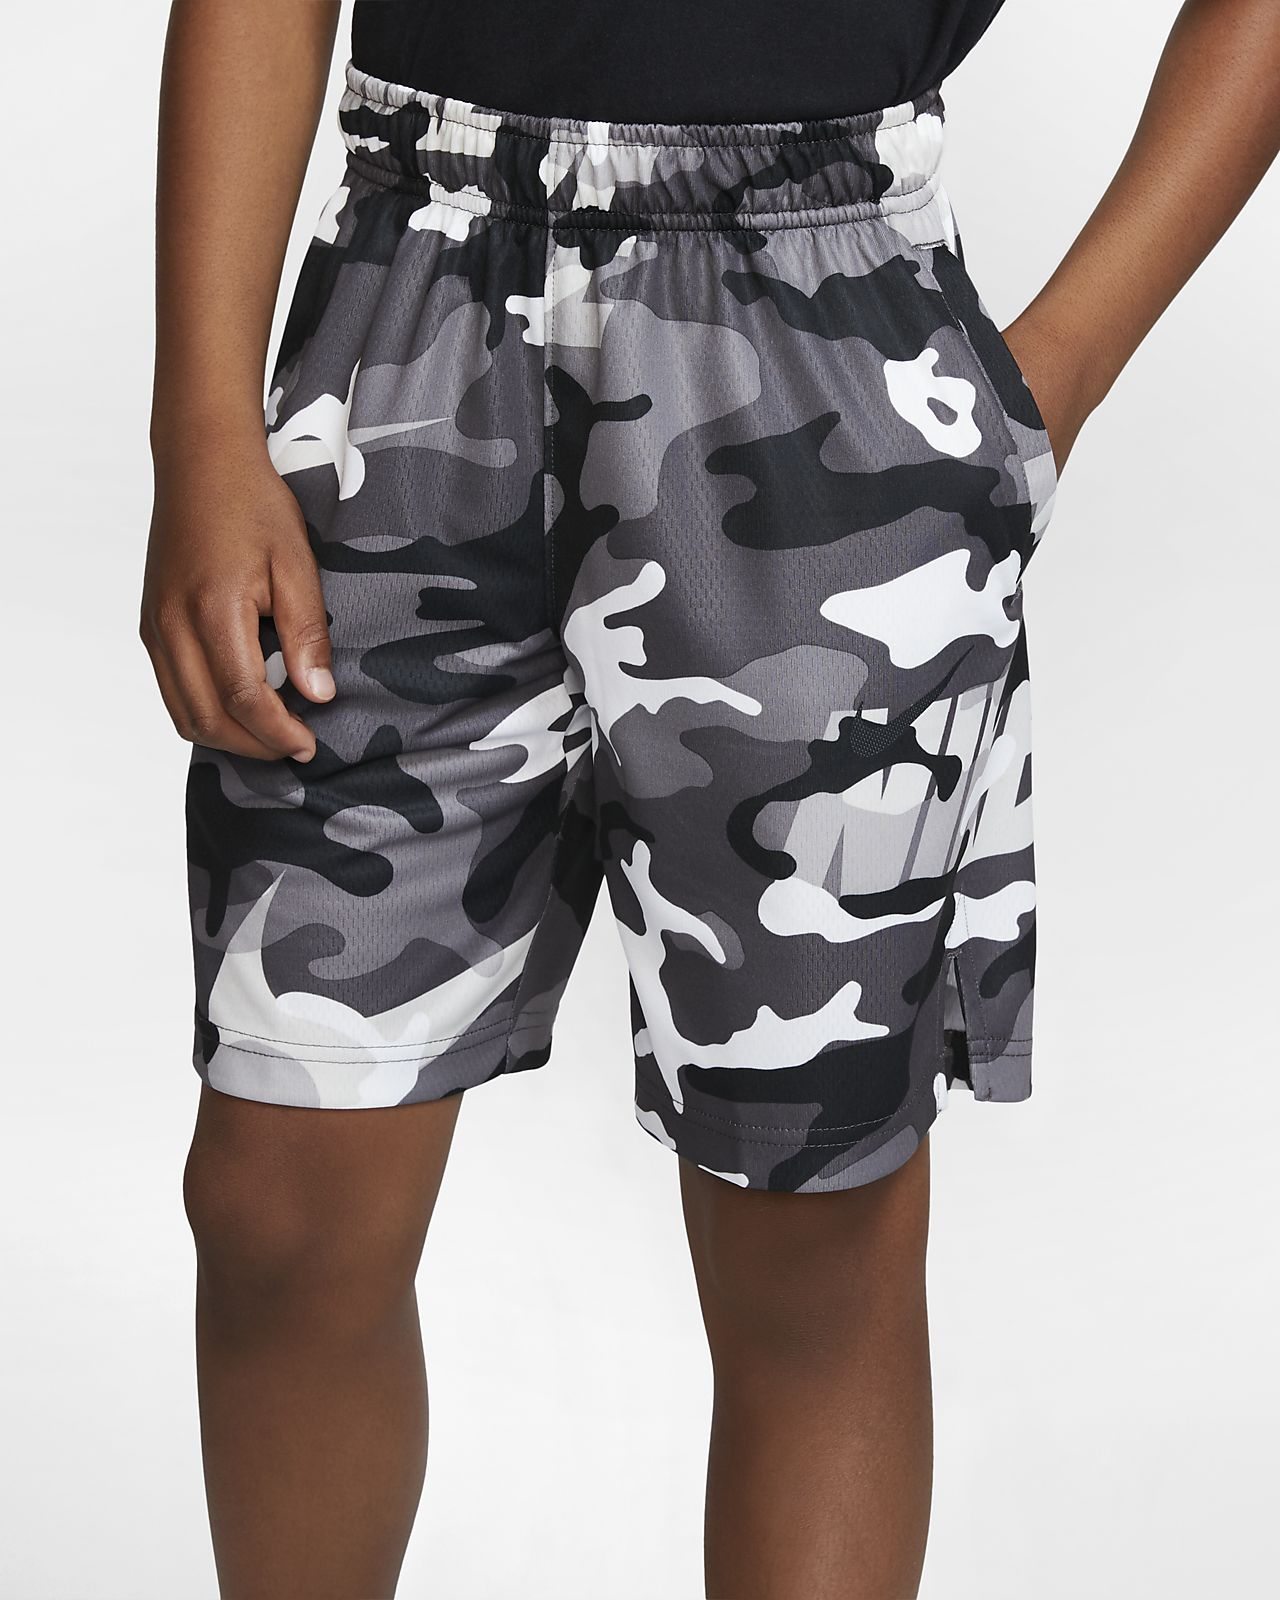 Shorts da training camo Nike Dri-FIT - Bambino/Ragazzo